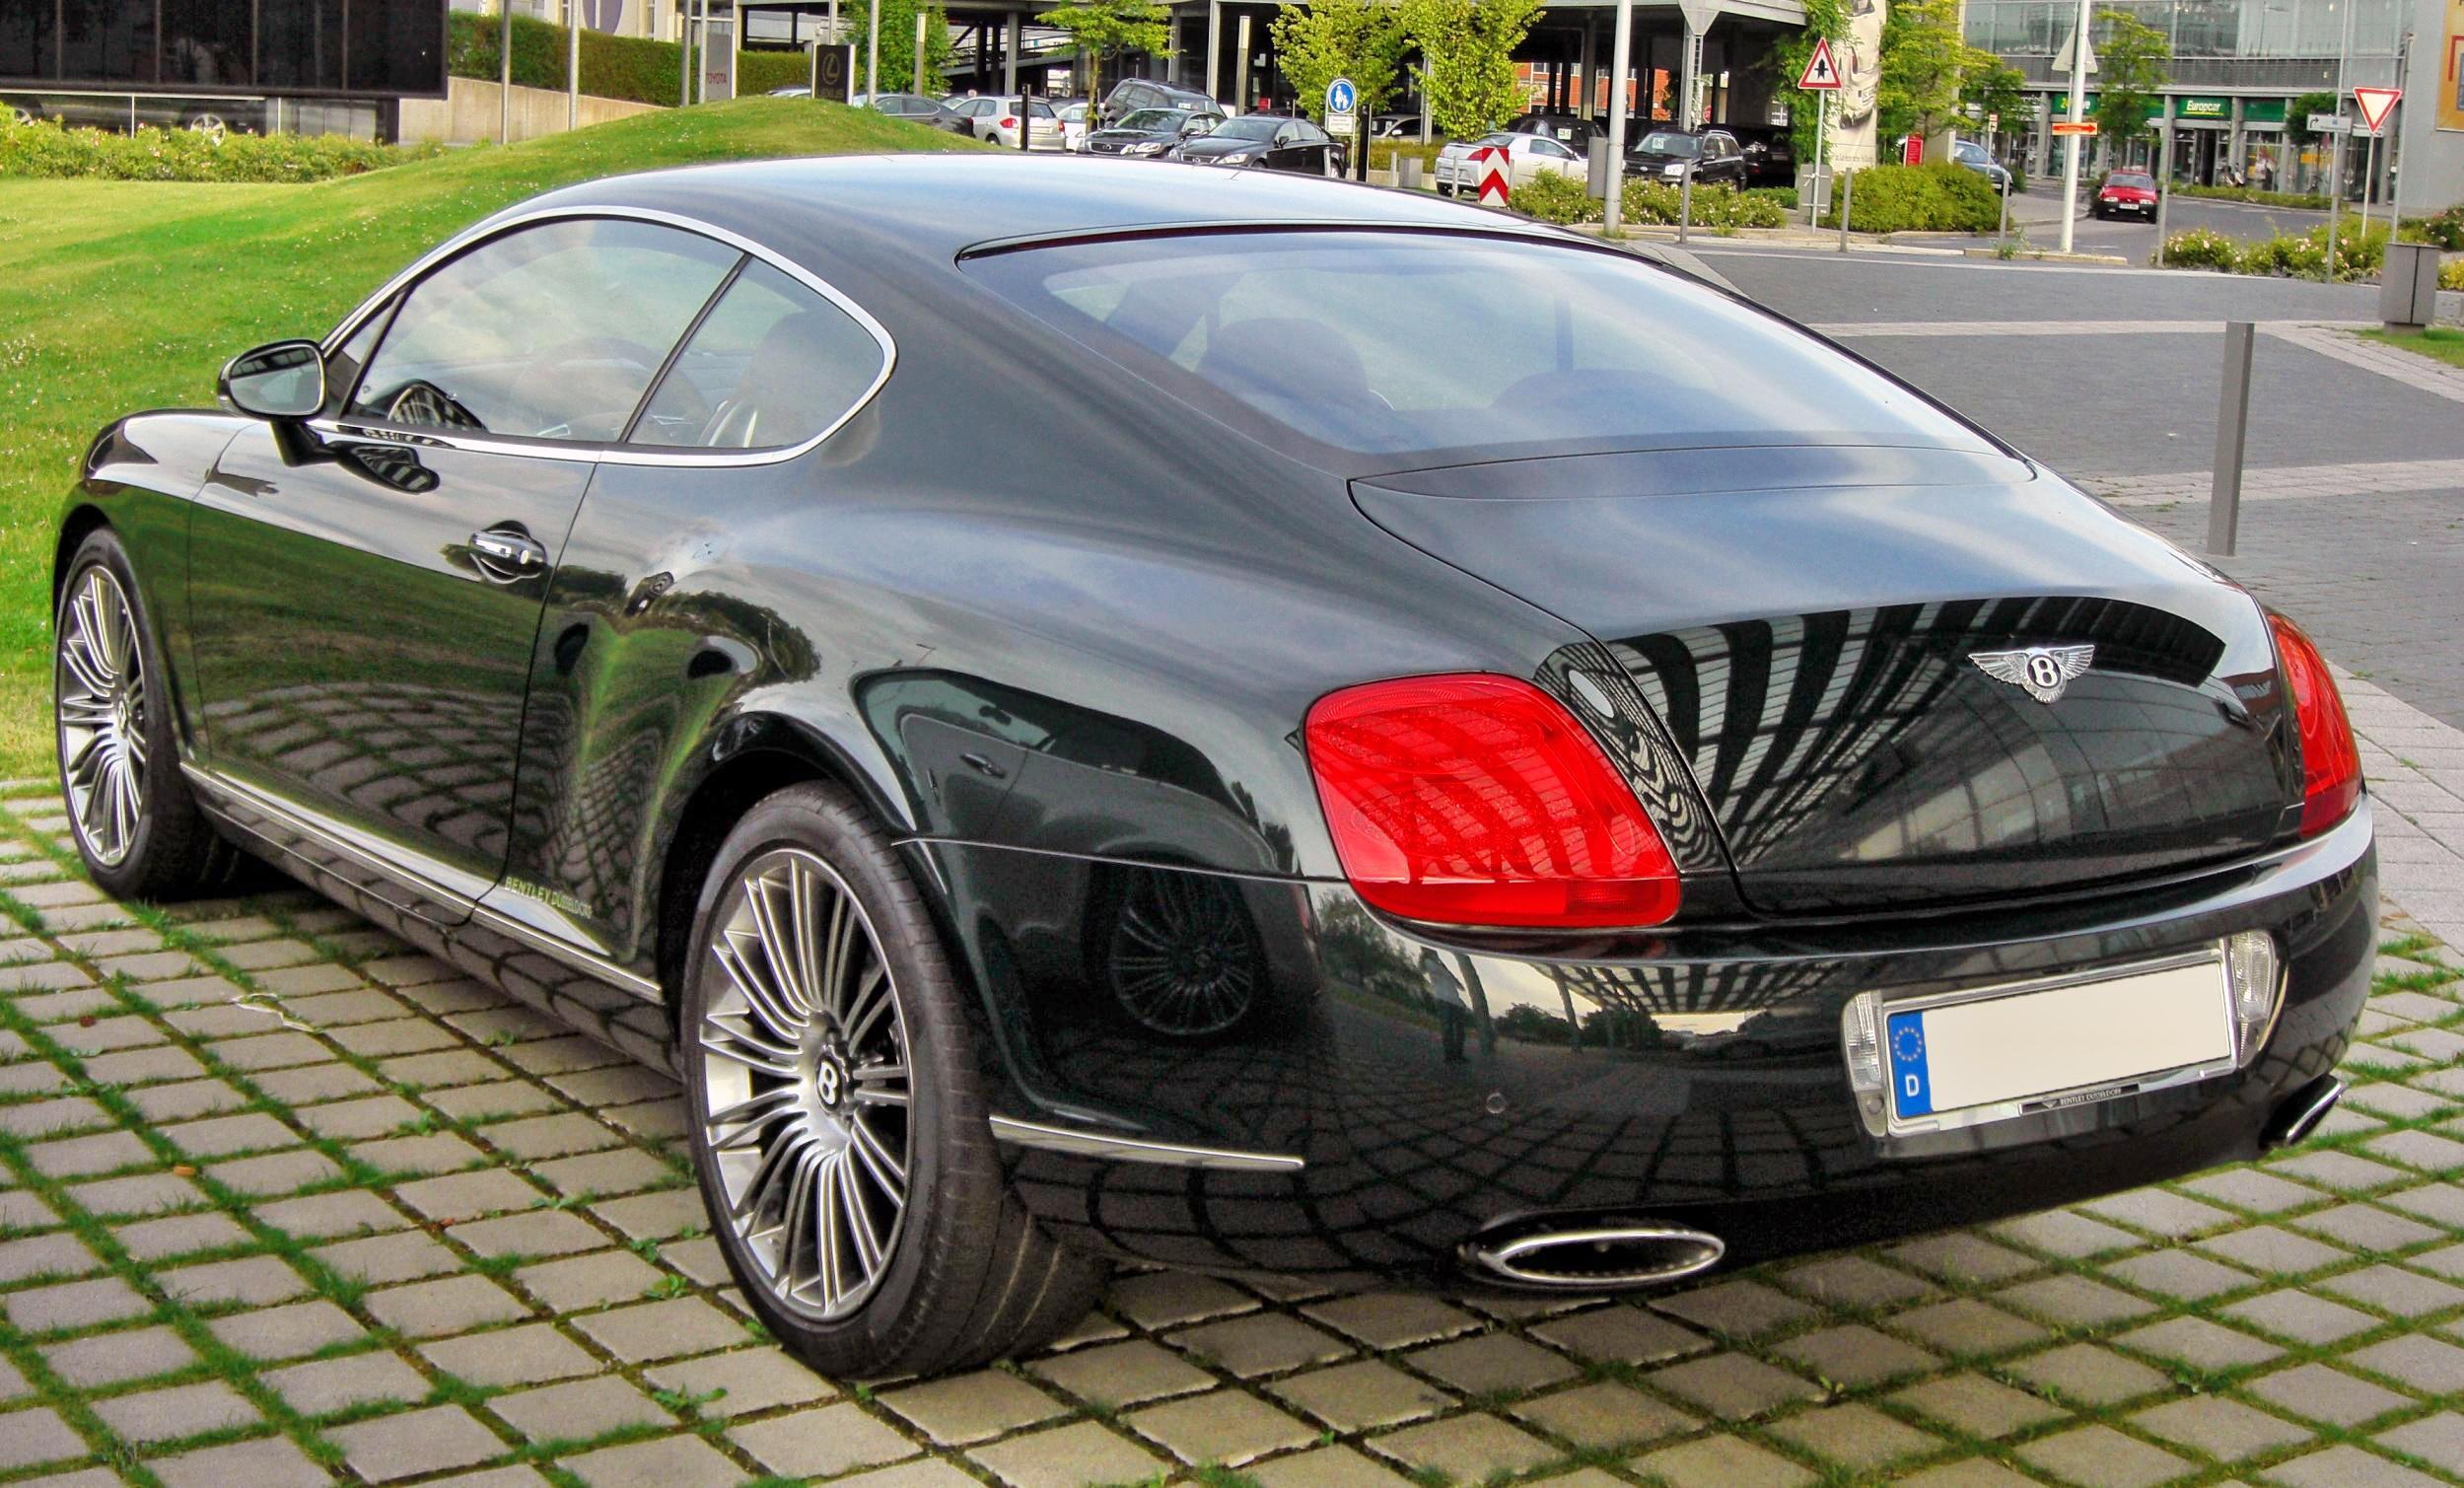 File Bentley Continental Gt Speed 20090720 Rear 1 Jpg Wikimedia Commons